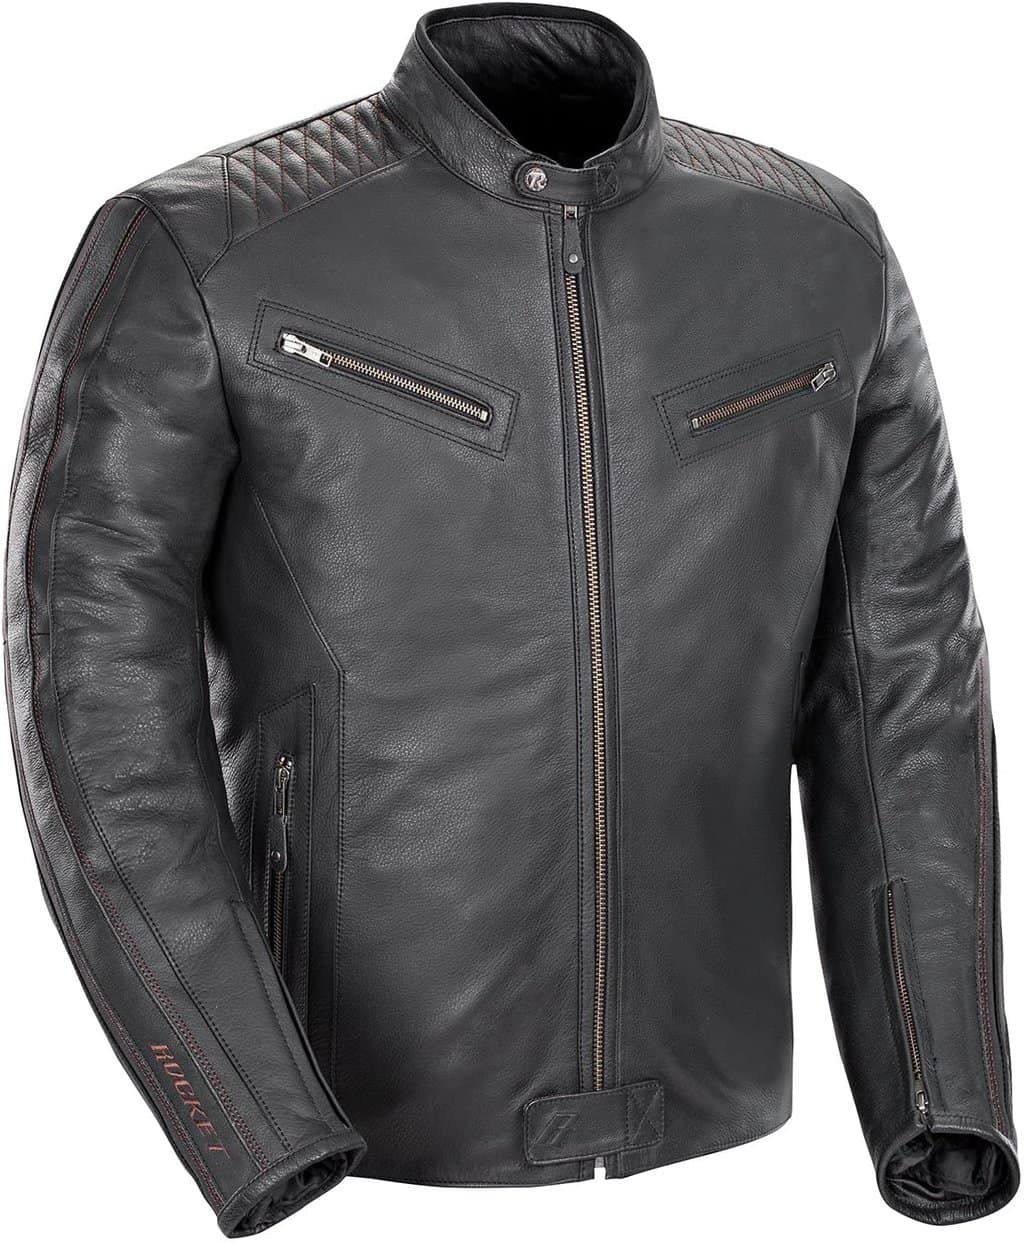 Joe-Rocket-Vintage-Rocket-Mens-Leather-Motorcycle-Jacket